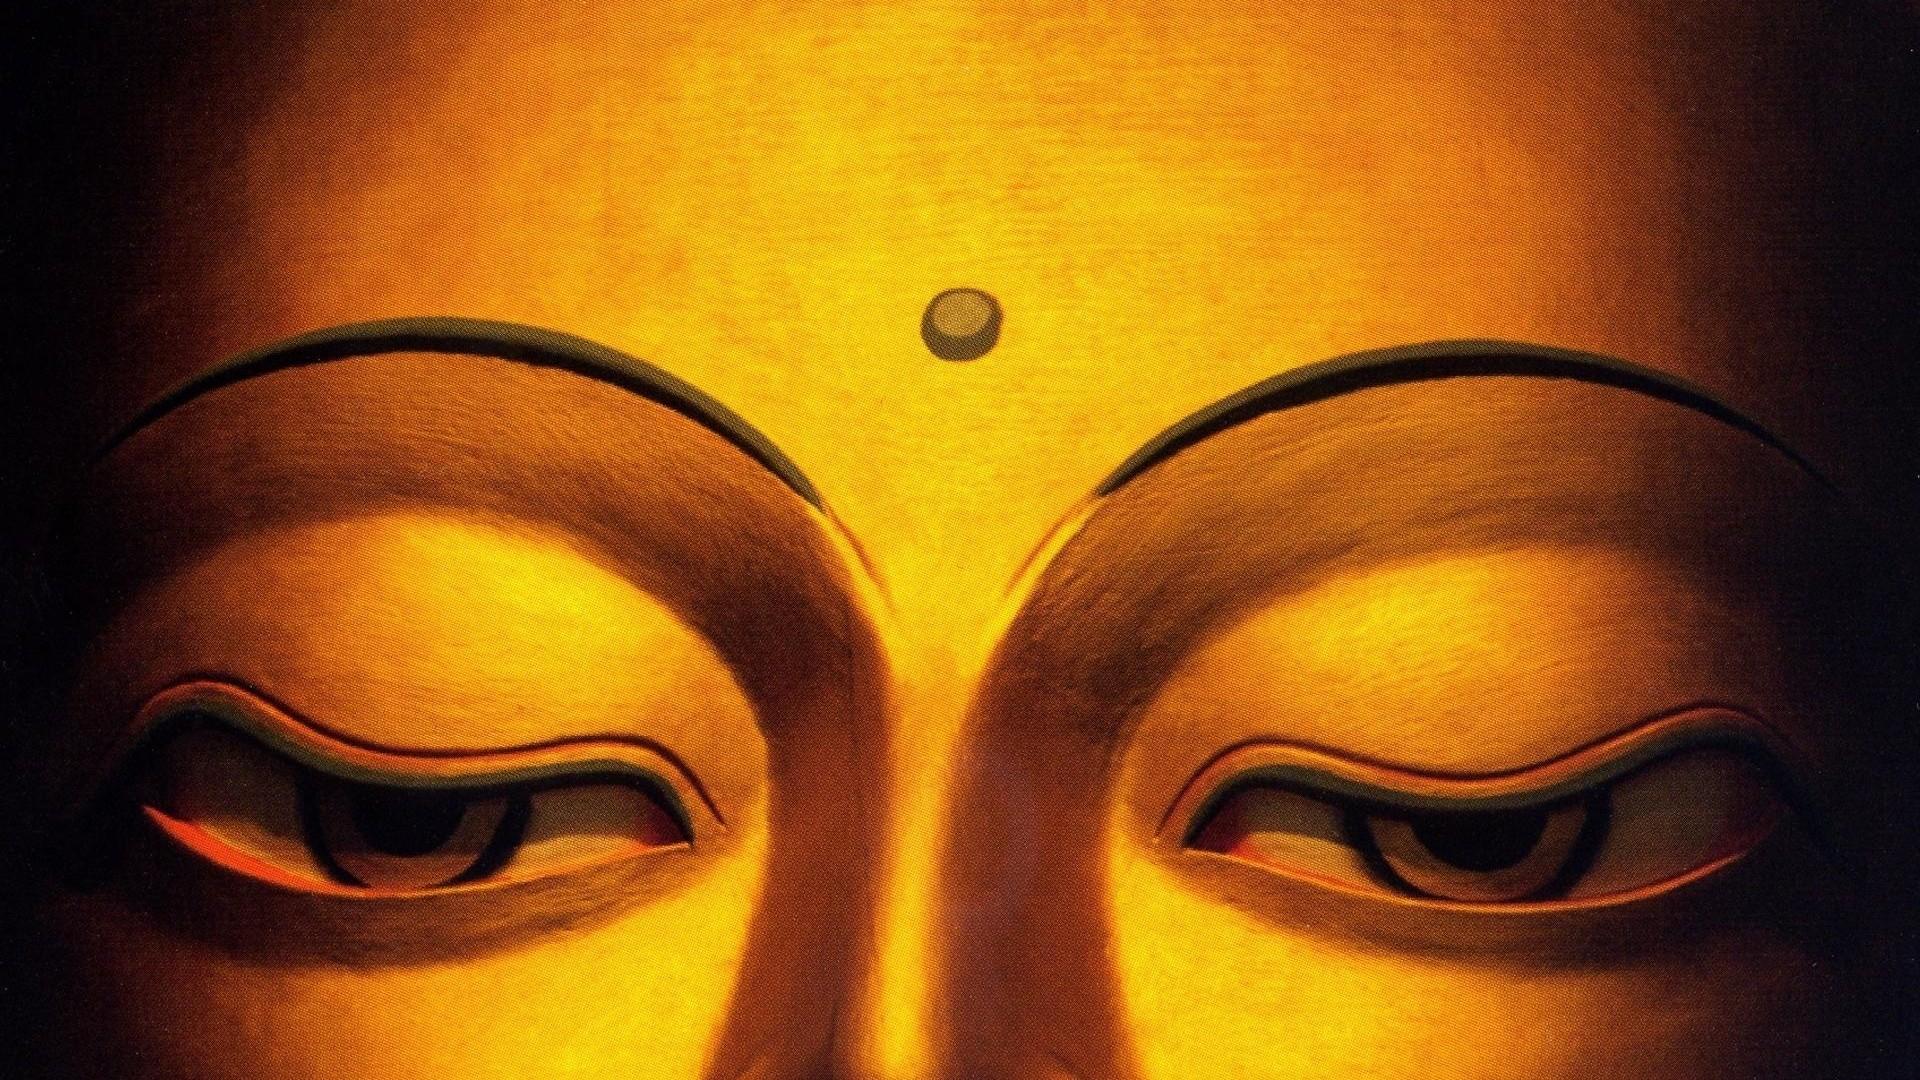 Eyes Of Buddha Image 1920×1080 Wallpapers 1080p